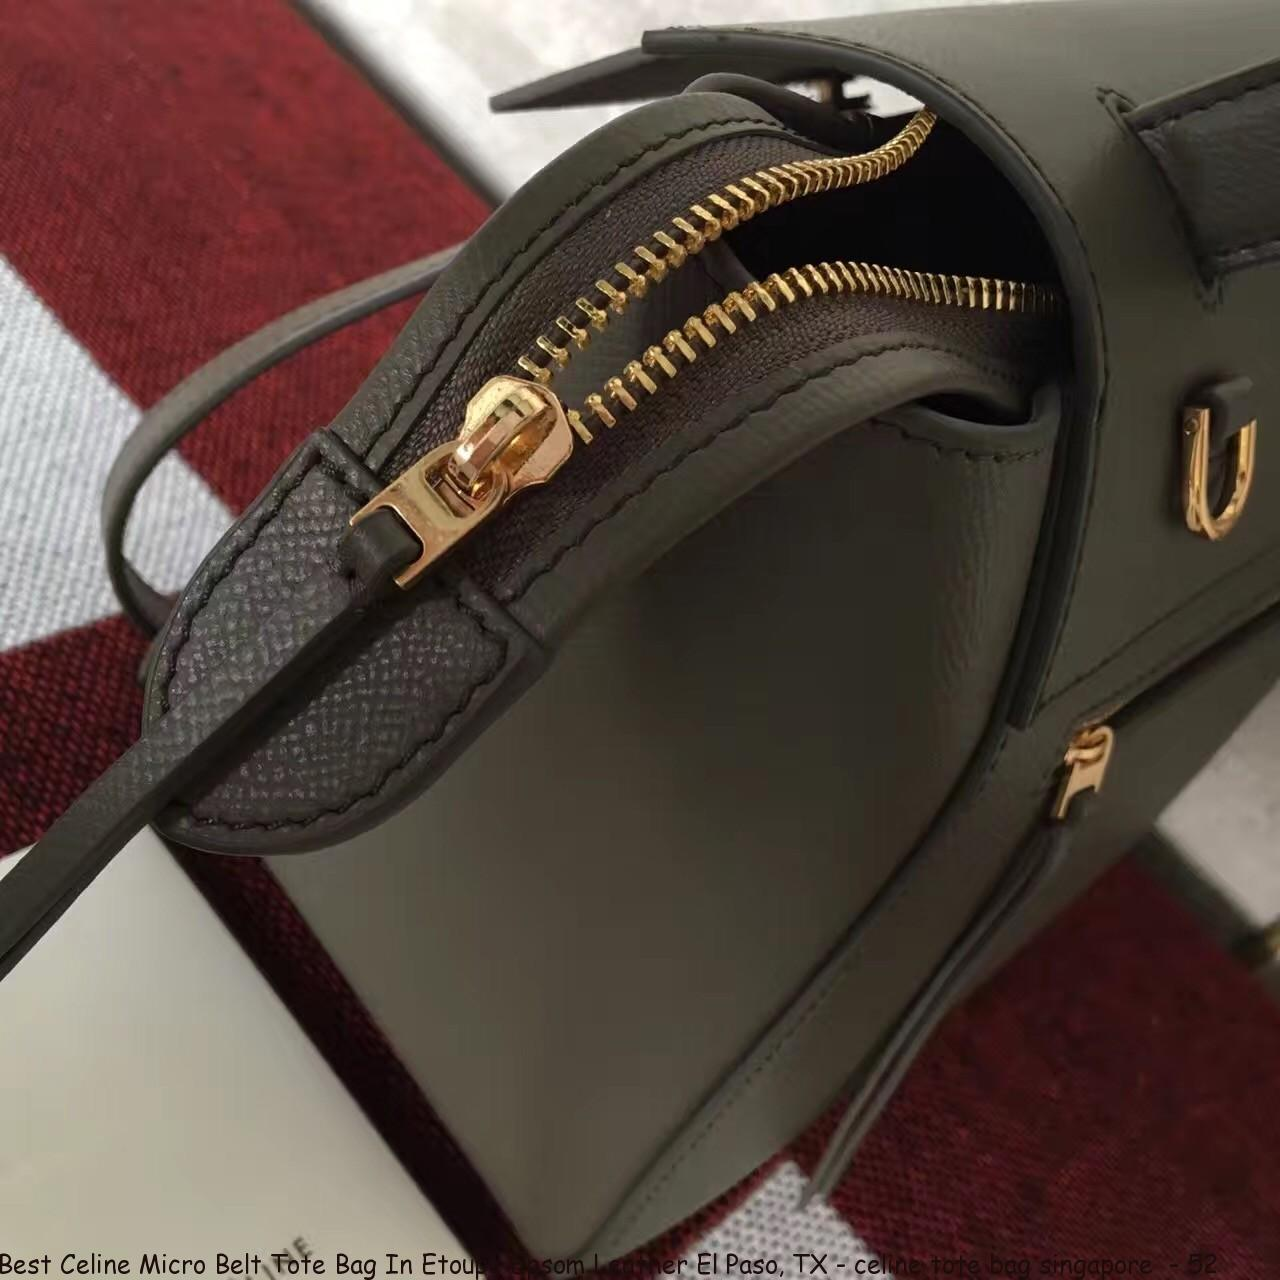 Best Celine Micro Belt Tote Bag In Etoupe Epsom Leather El Paso Tx Celine Tote Bag Singapore 52 Cheap Replica Celine Handbags 70 Off